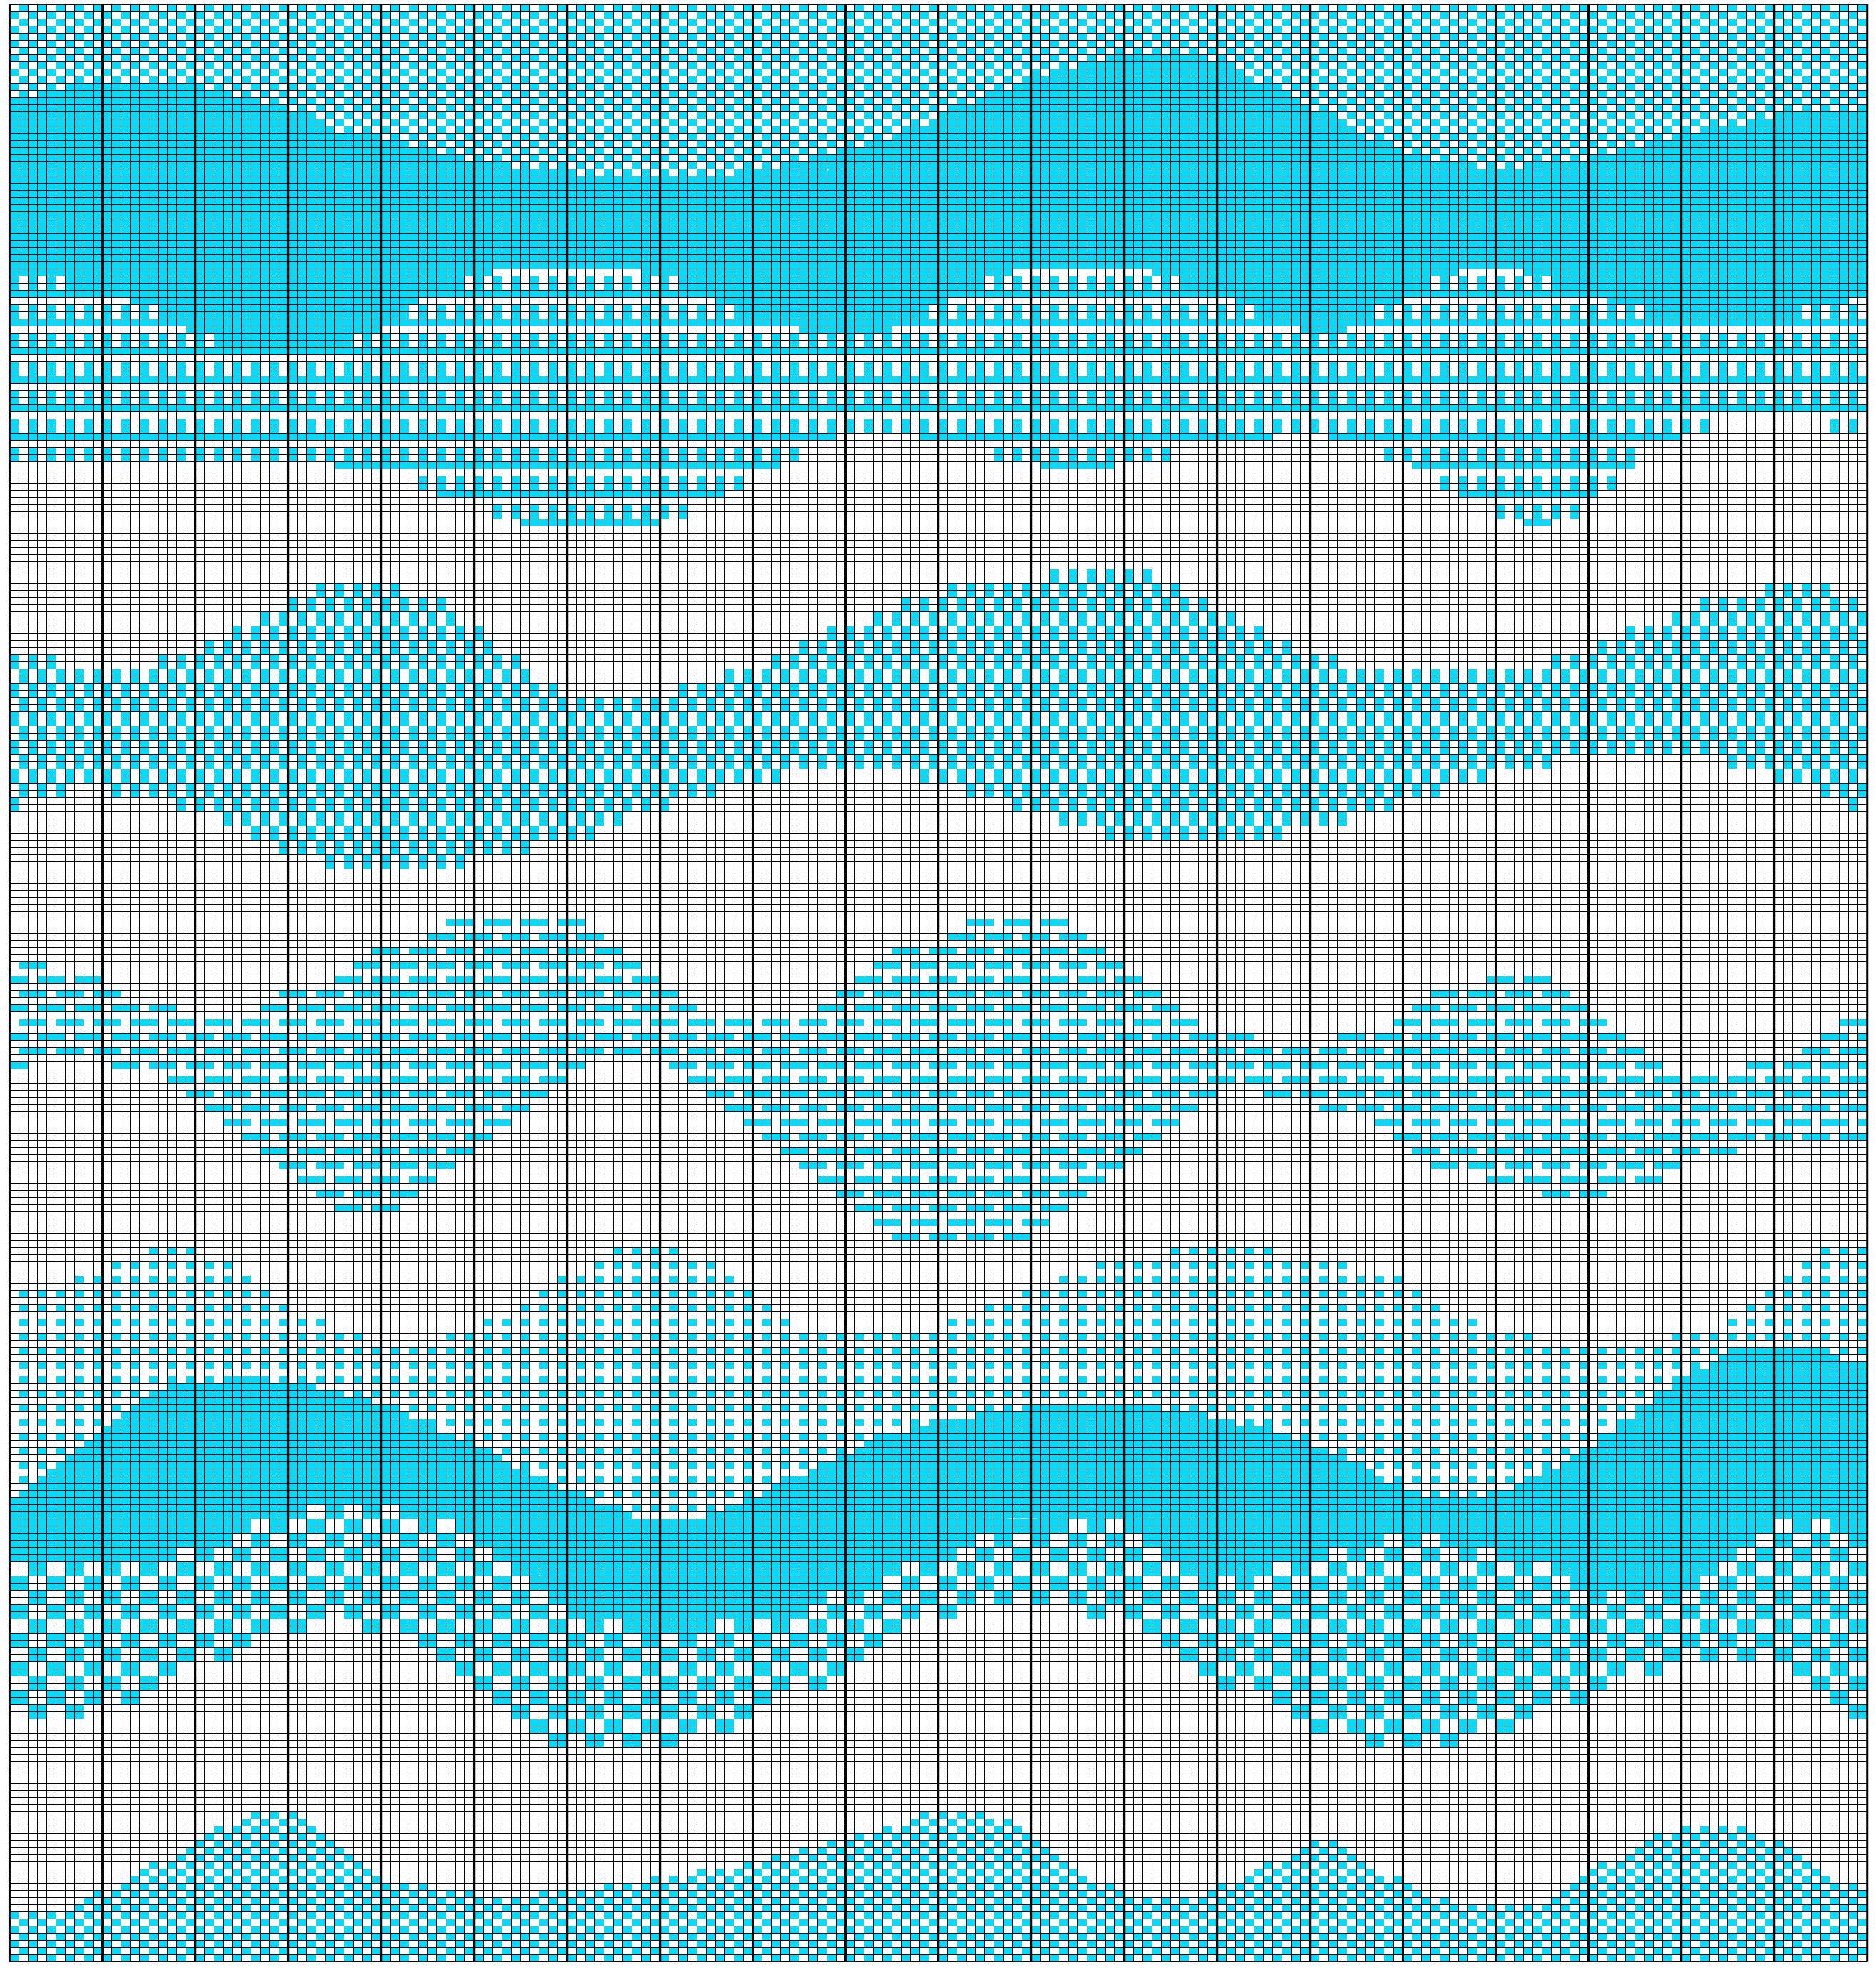 ODDknit - Free Knitting Patterns - Charts - Free Form Waves - Waves 01